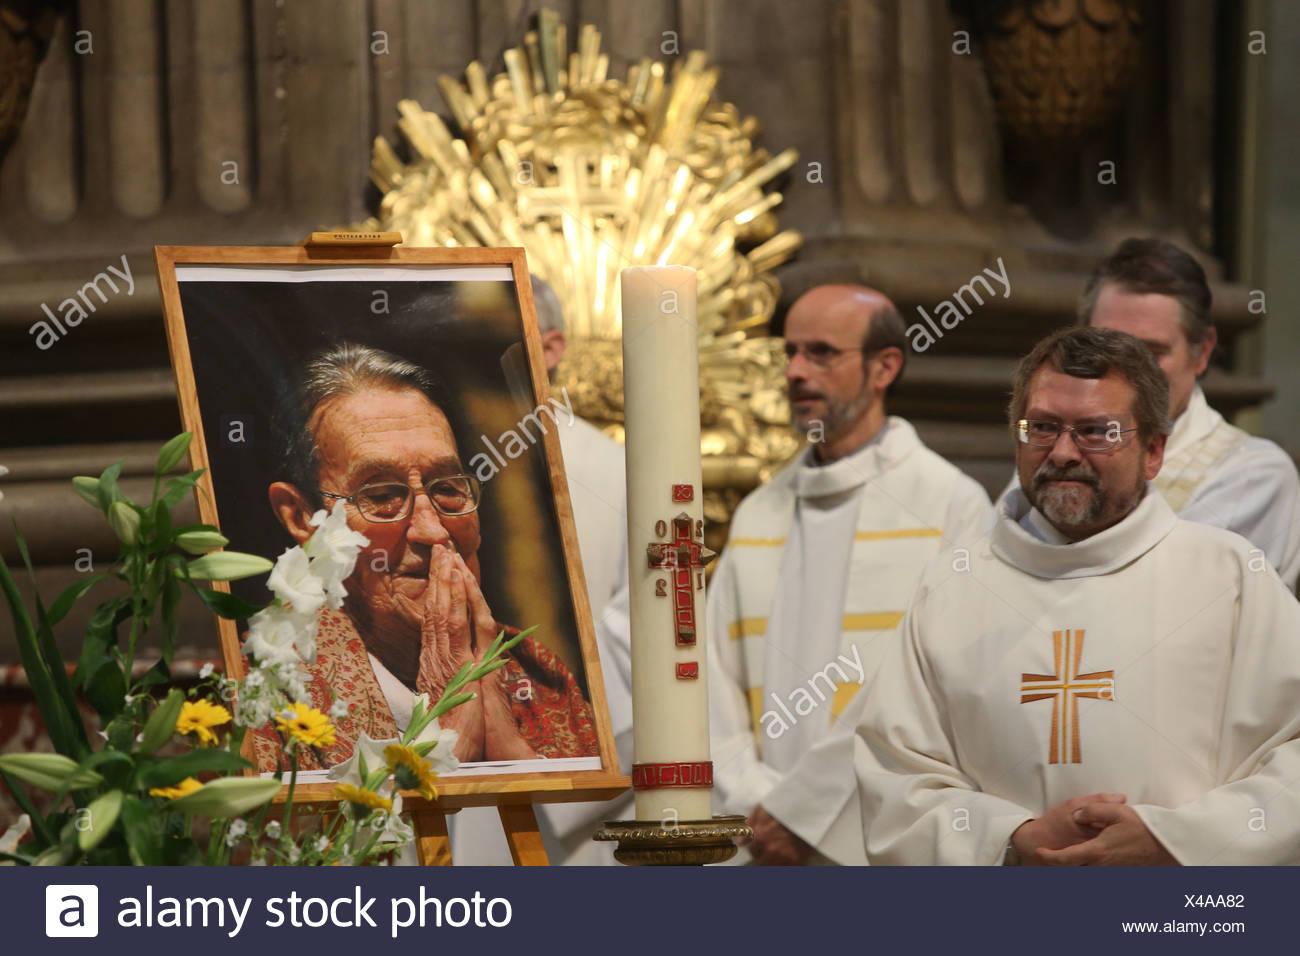 Saint Sulpice church. Tribute to father Pierre Ceyrac. Paris. France. - Stock Image